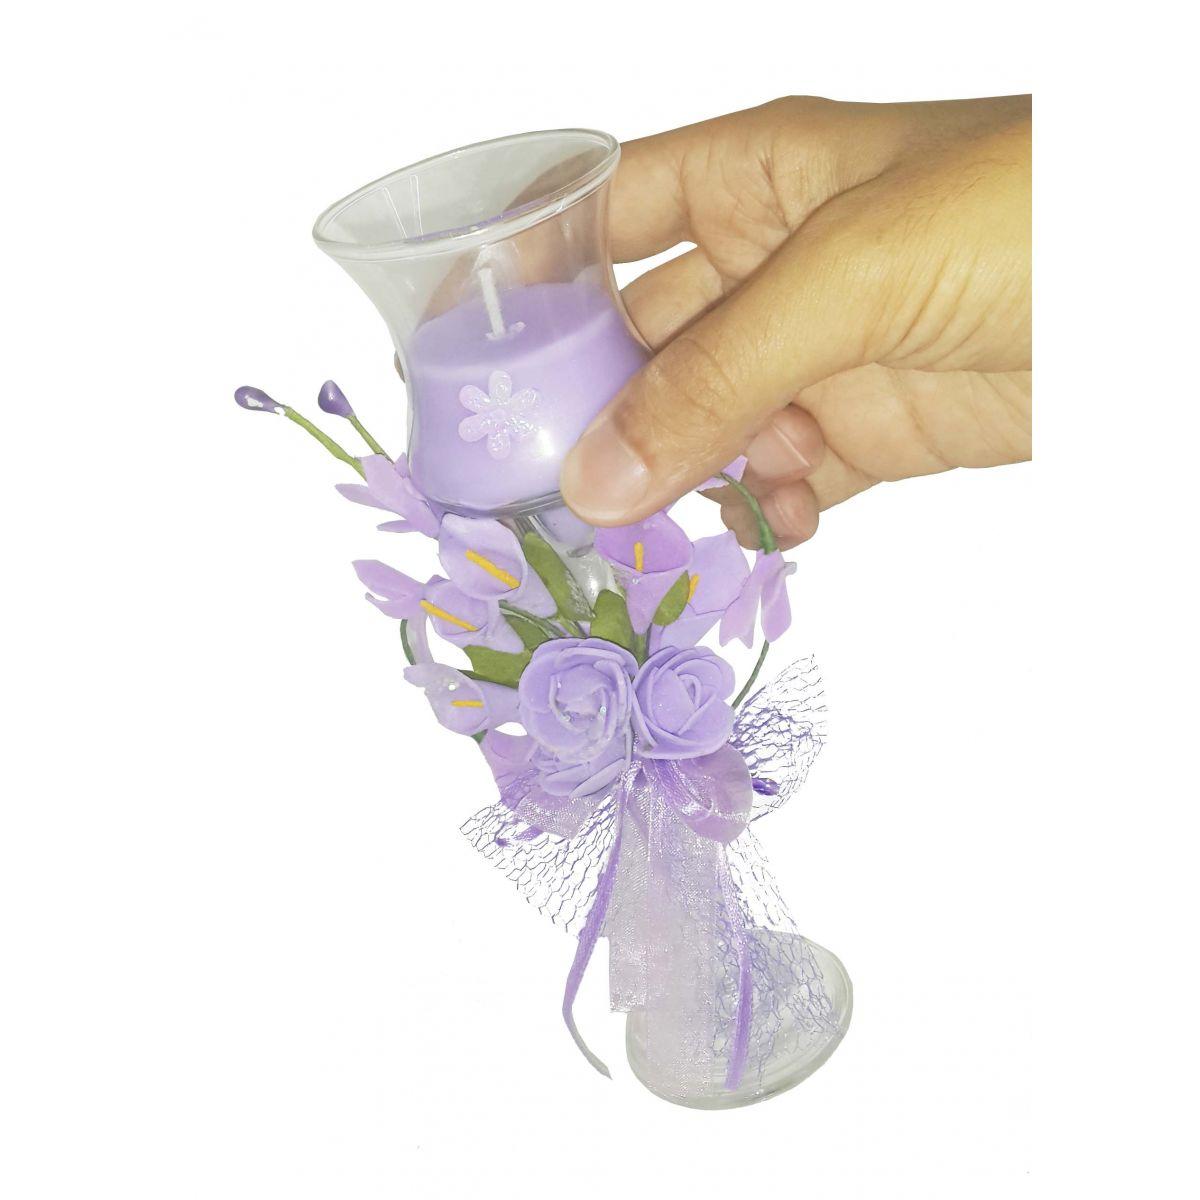 Vela Parafina Aromatizante Decorativa Media Fragrancia Flores Lilas (WL-B)